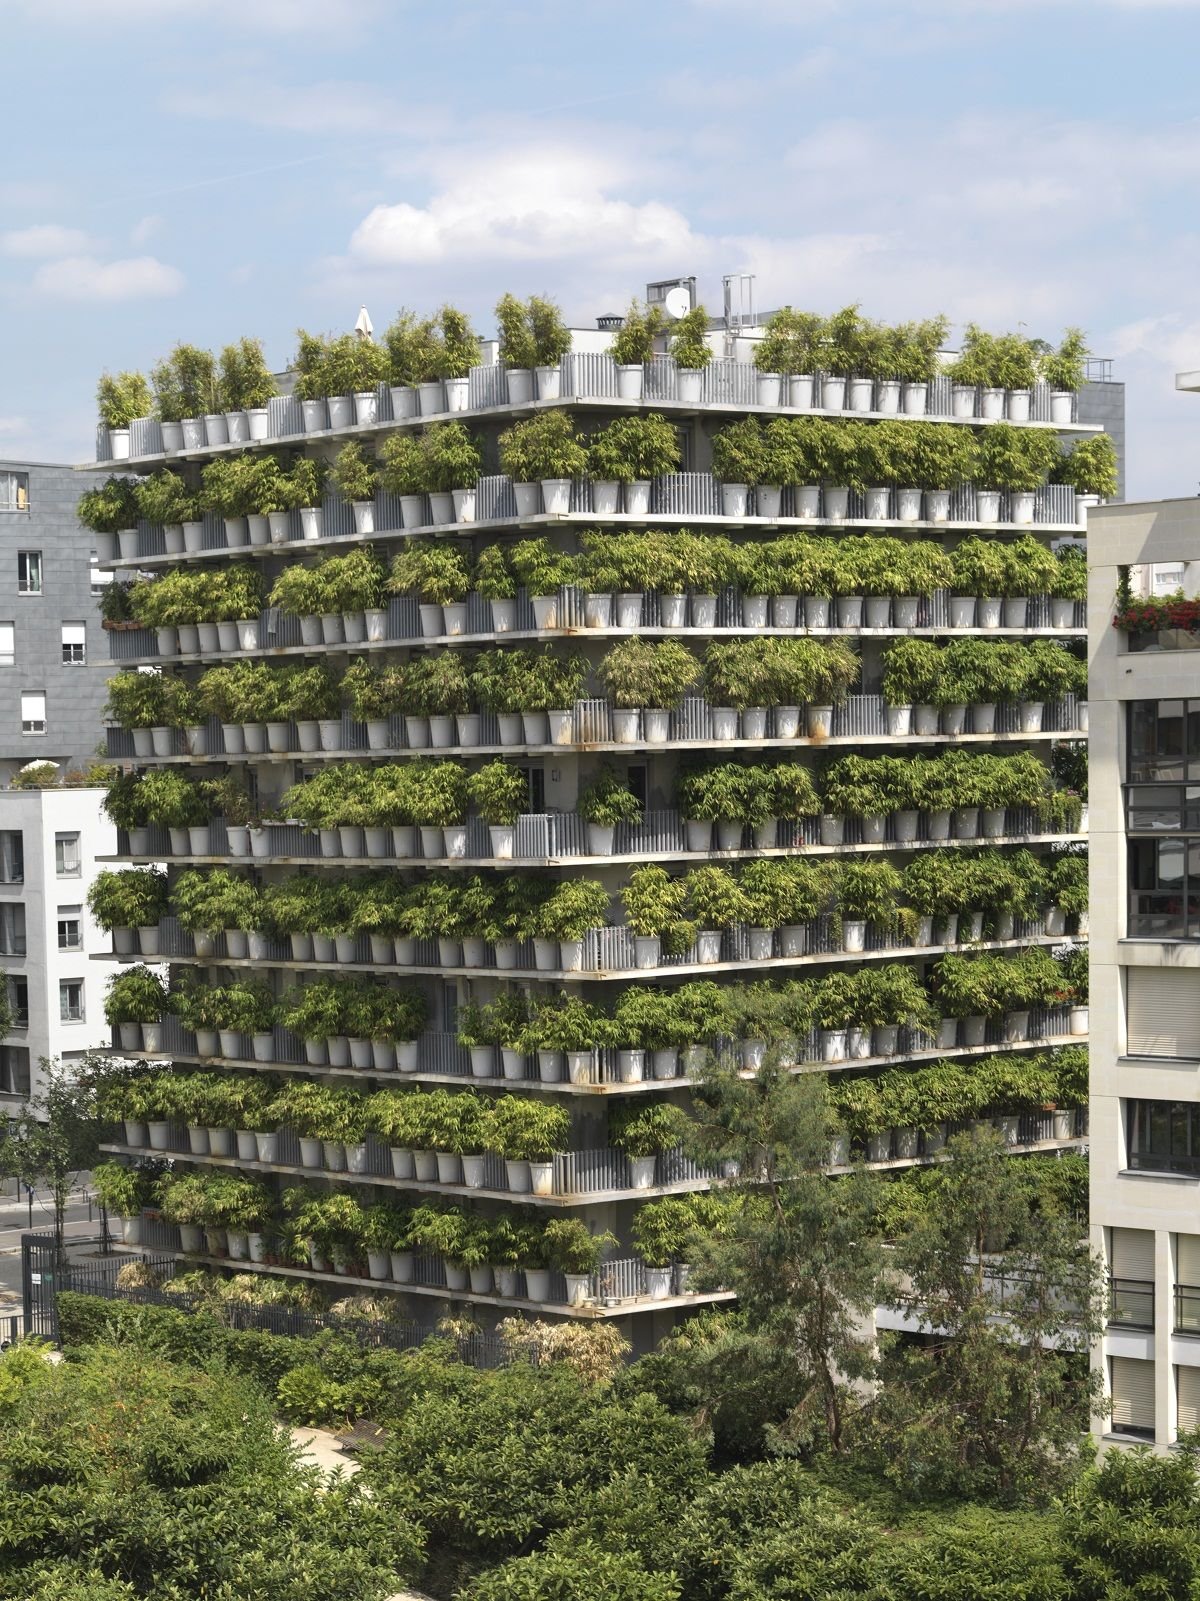 immeubles verts une tendance croissante v g talisation urbaine pinterest architecture. Black Bedroom Furniture Sets. Home Design Ideas